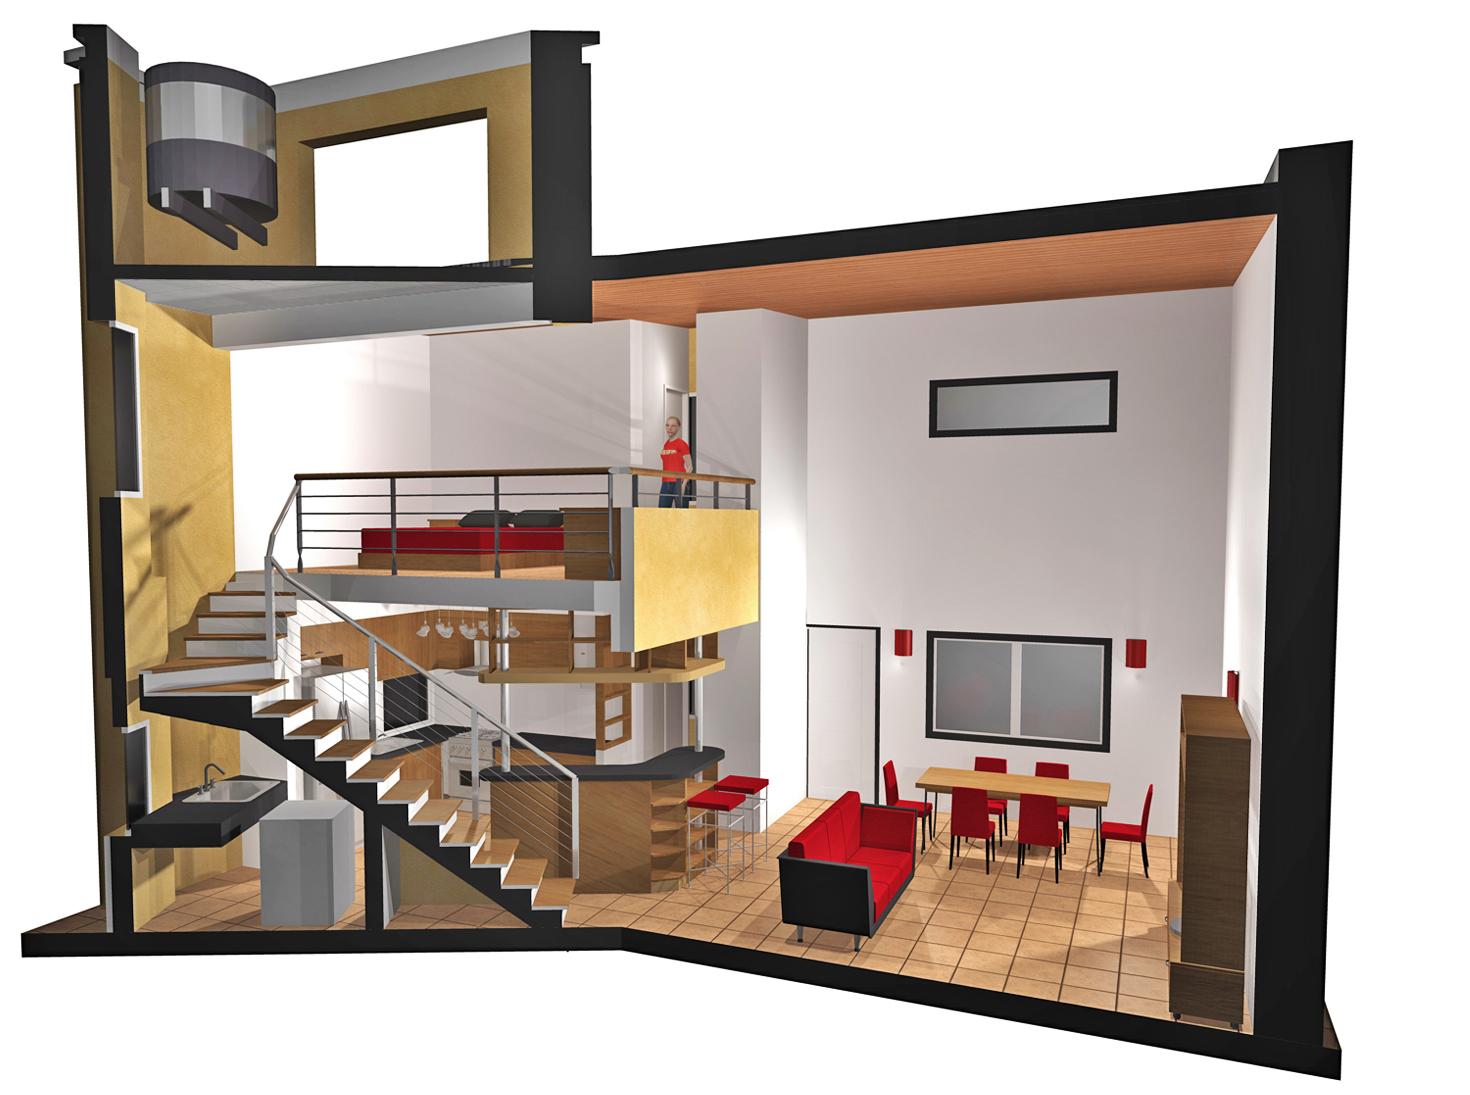 Arquitectura y dise o 2011 casa tipo loft for Casas loft diseno